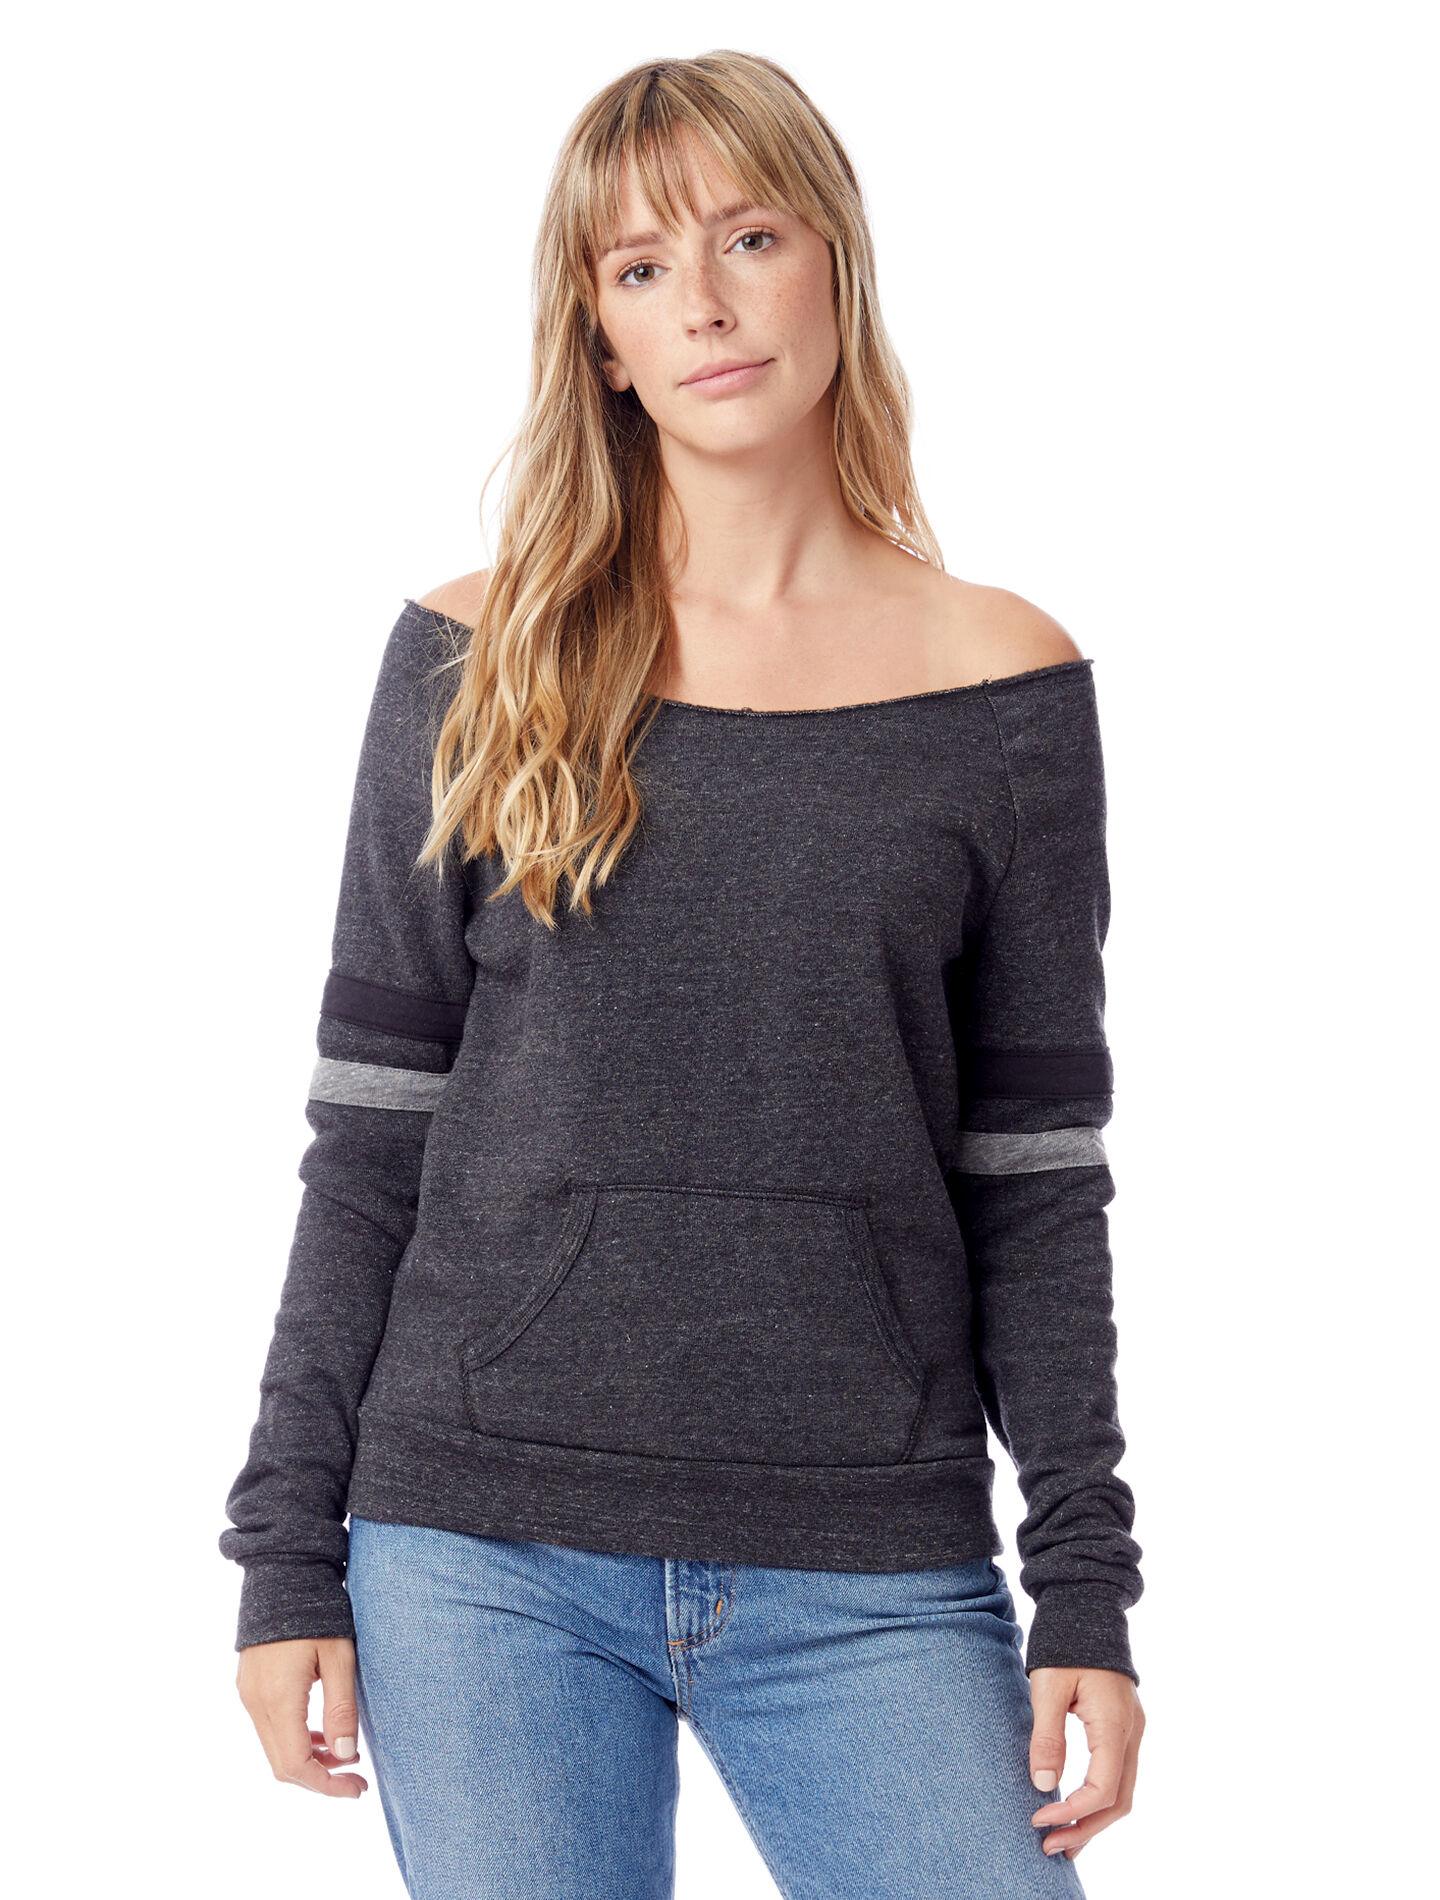 Alternative Apparel Maniac Sport Eco-Fleece Sweatshirt - Eco Black - Size: M